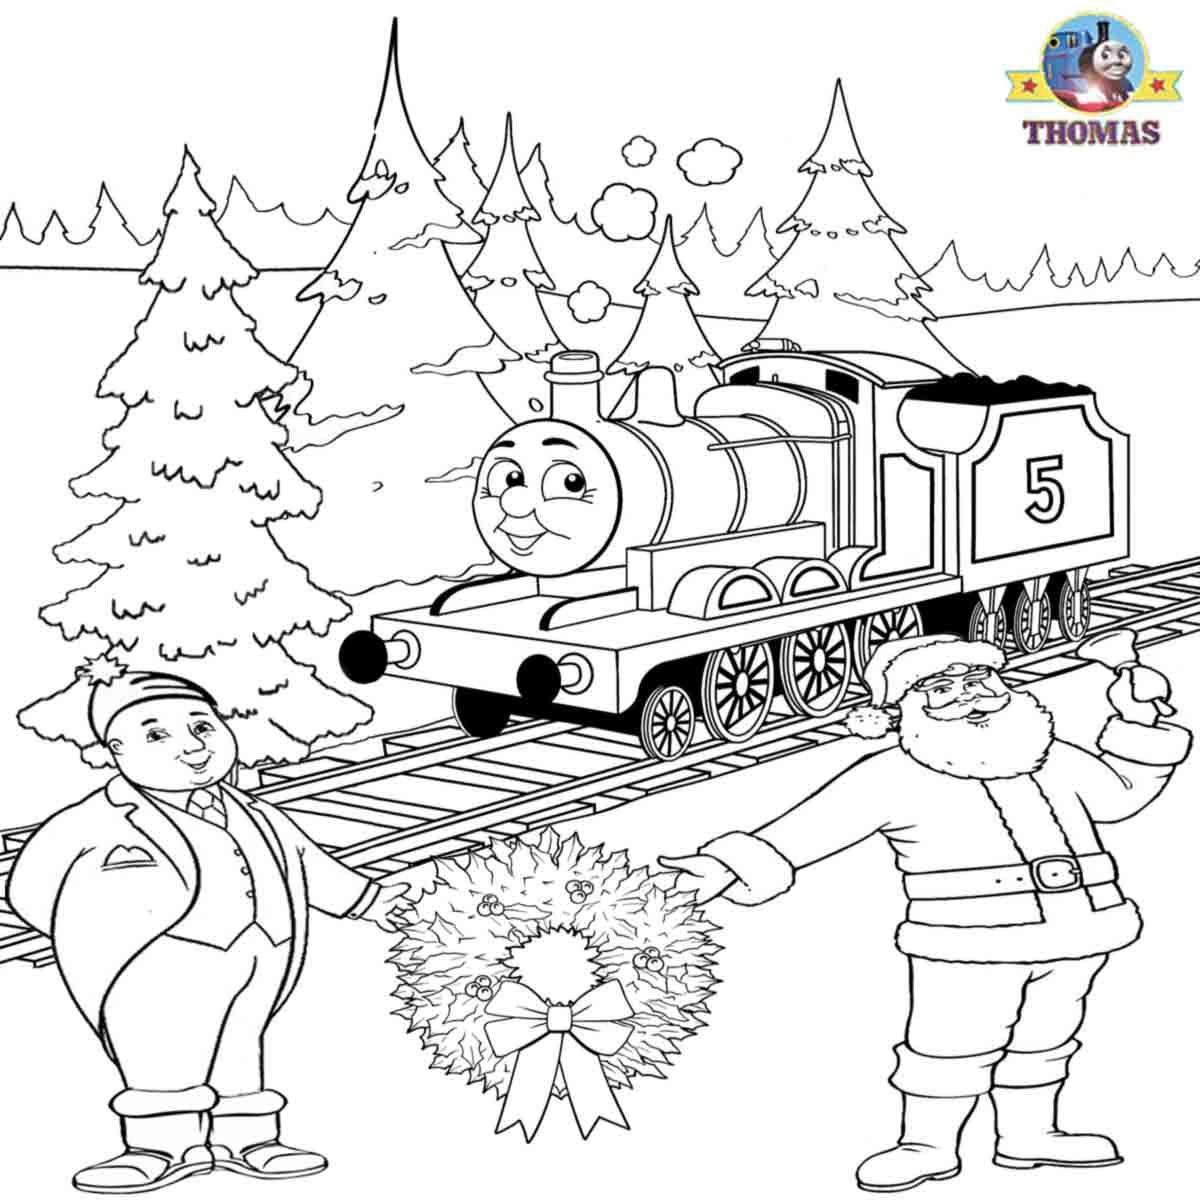 We+let+it+snow+Kid+free+worksheets+James+train+Santa+Claus